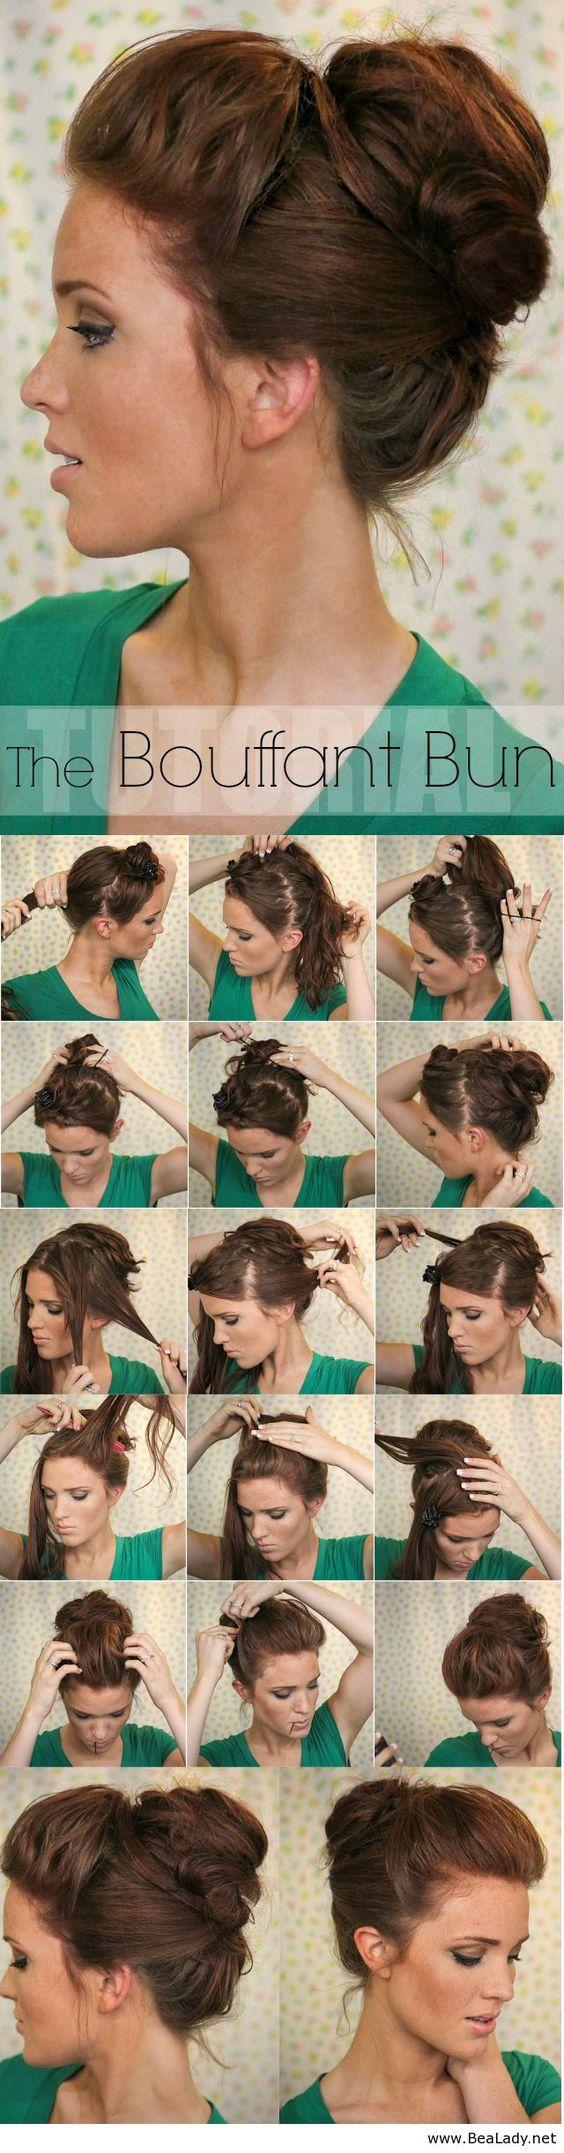 Admirable Bun Updo Simple Bun And Bun Hairstyles On Pinterest Hairstyles For Men Maxibearus